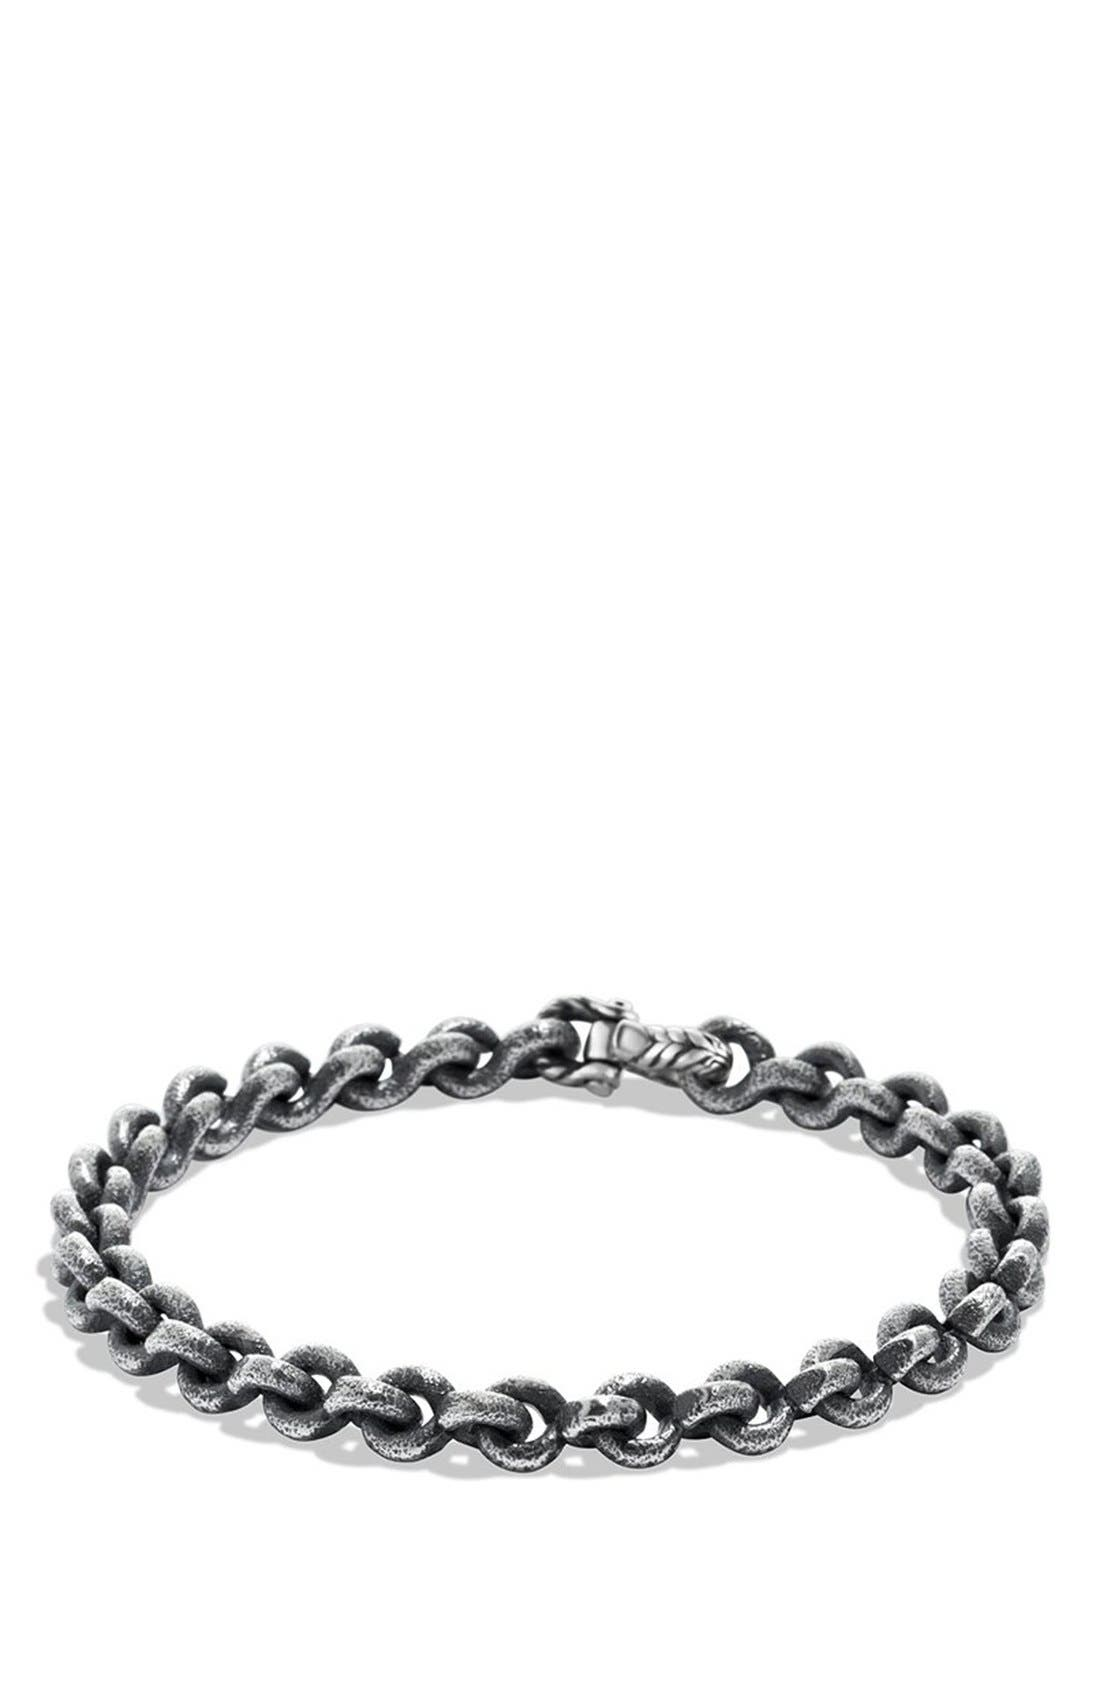 David Yurman 'Petrvs' Chain Bracelet